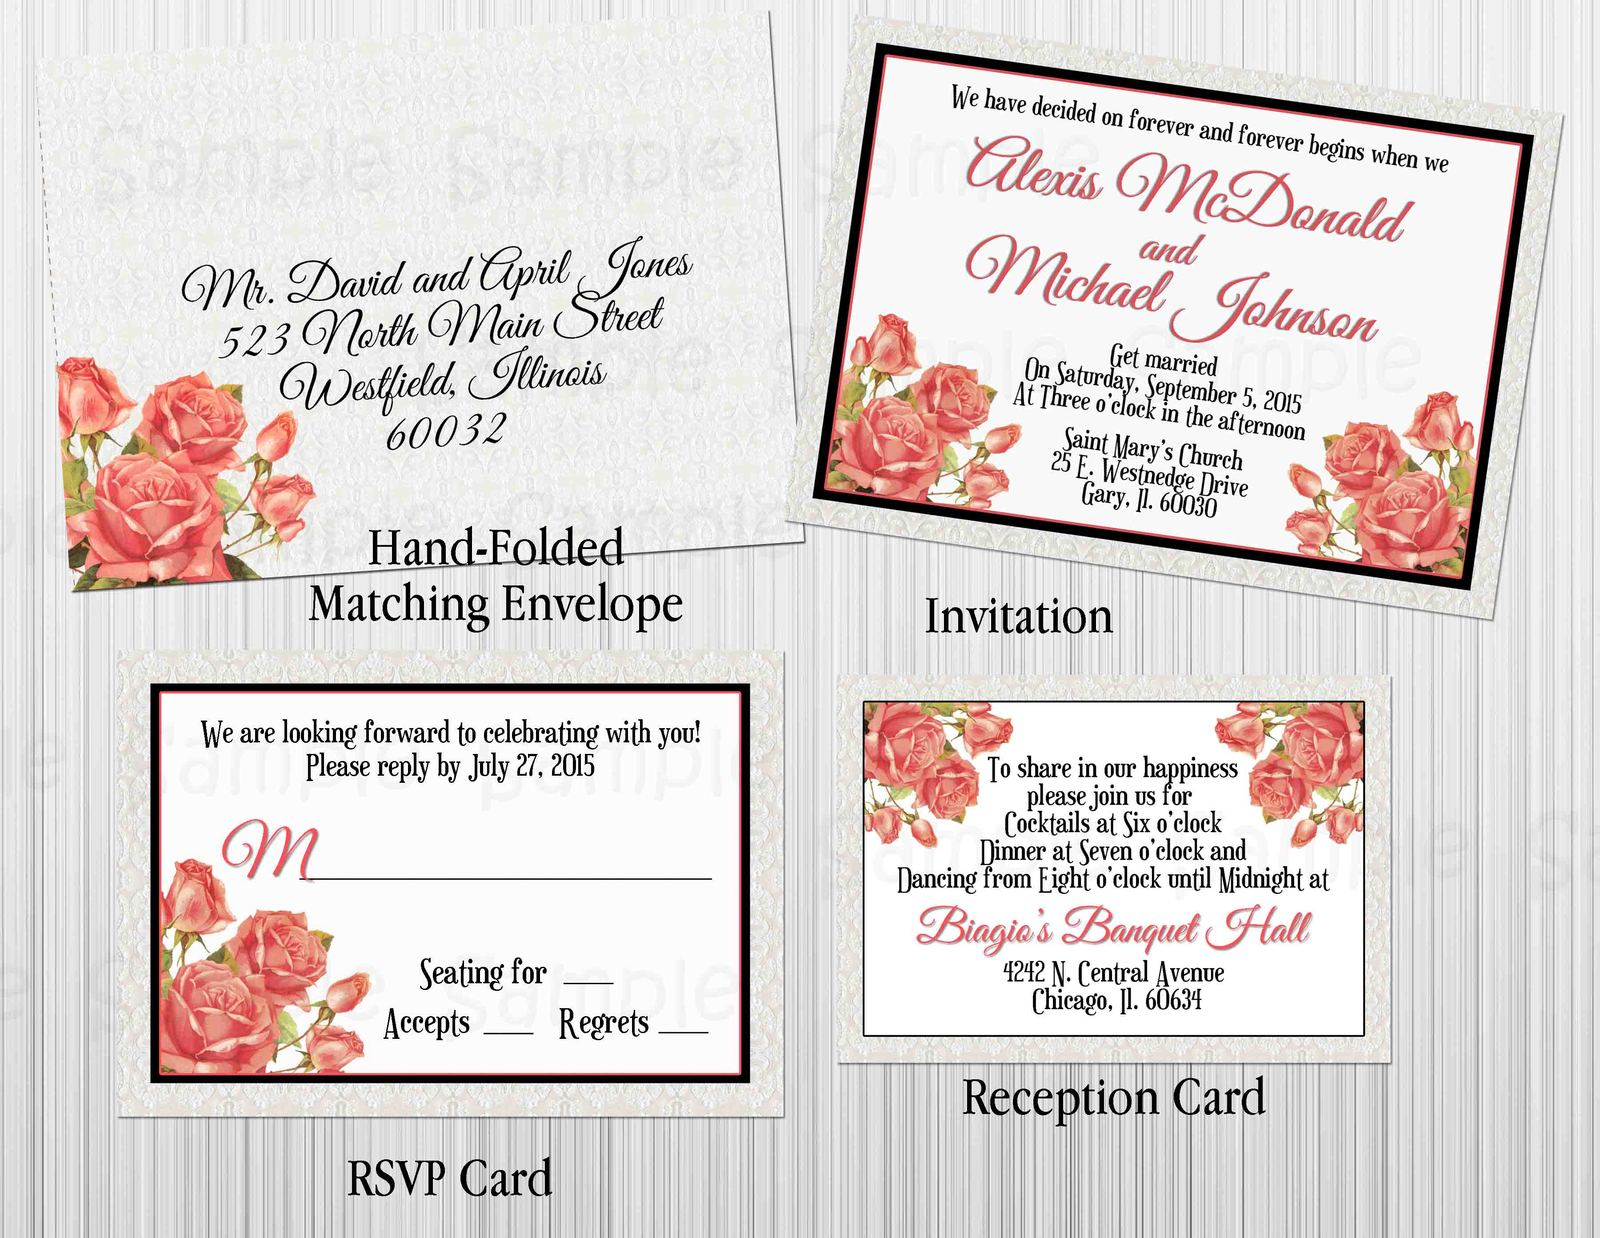 Roses & Lace Wedding invitation Set: RSVP, Reception, Invitation, Envelope